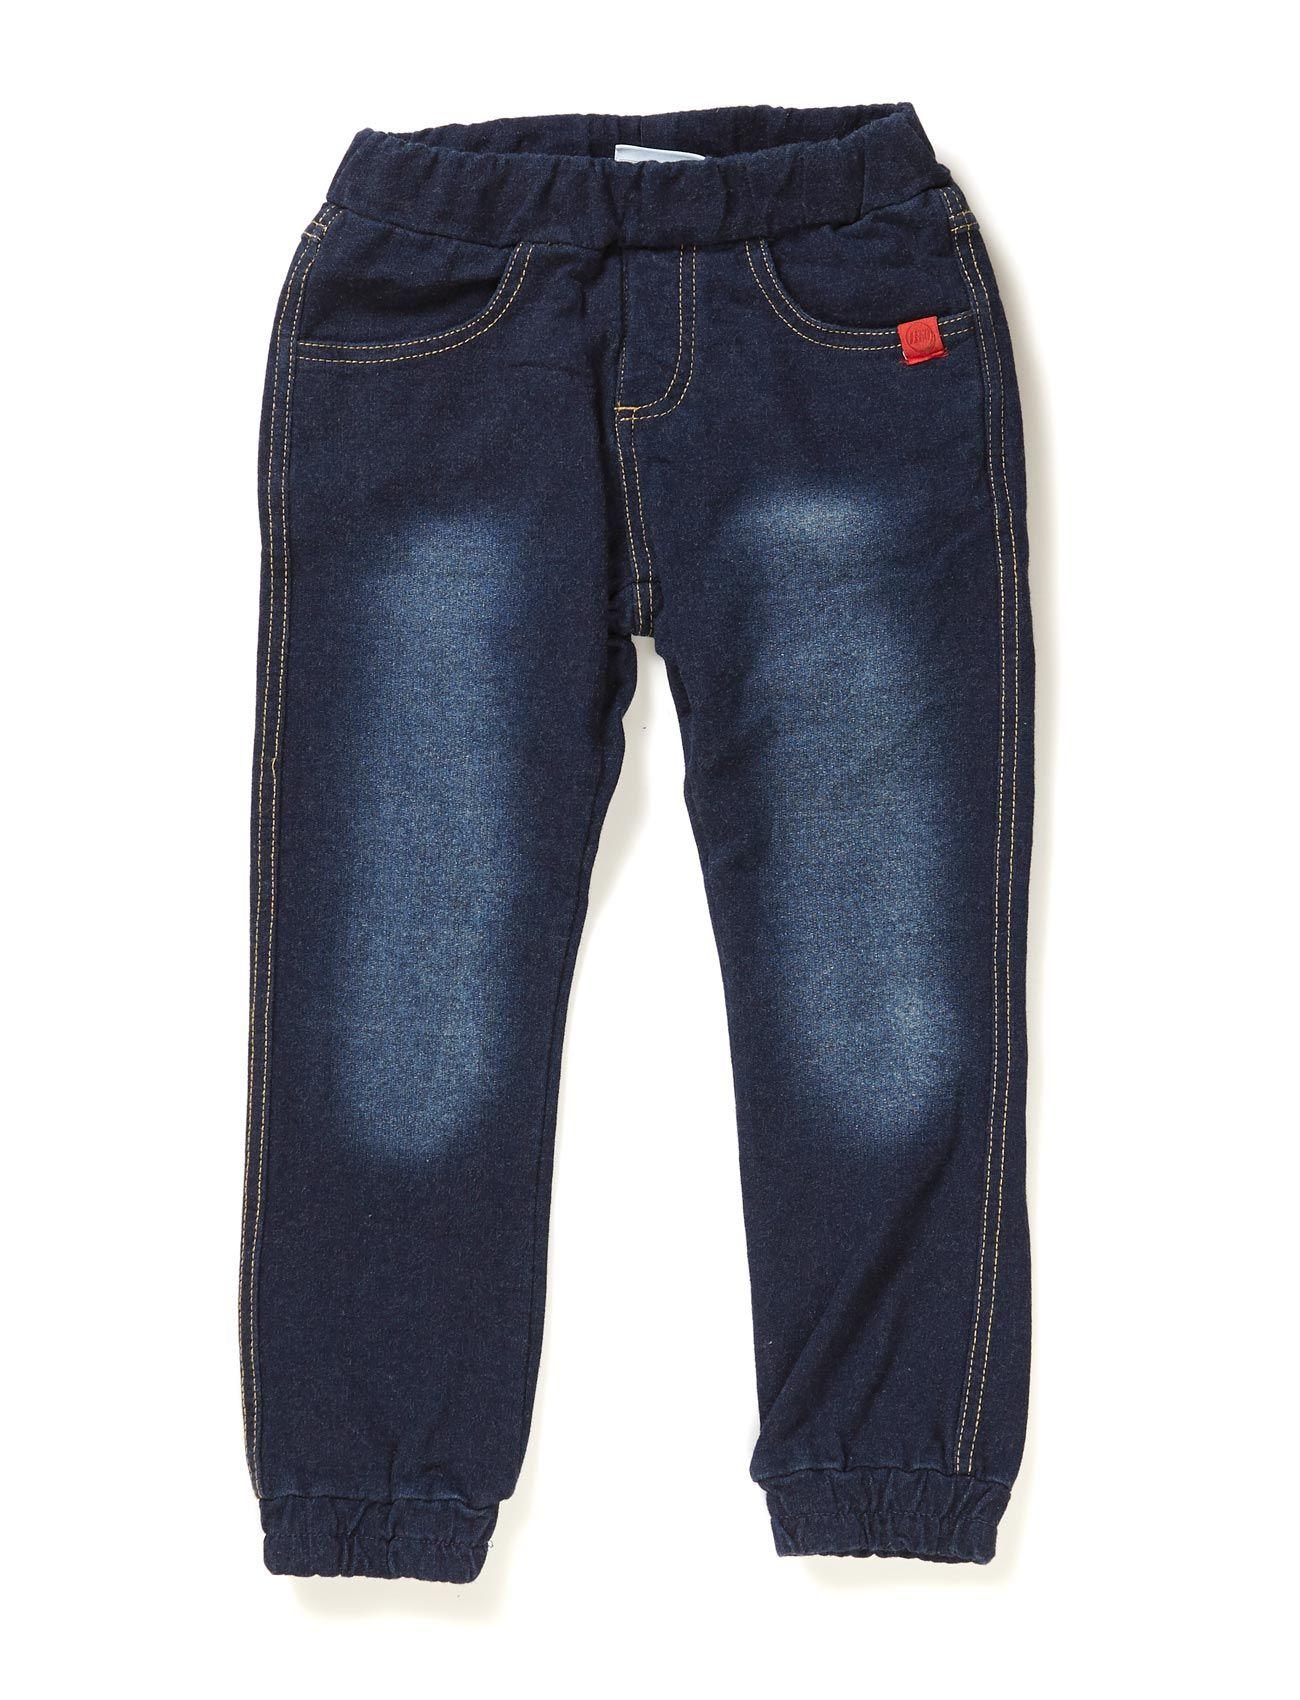 lego wear Explore 501 - jeans fra boozt.com dk